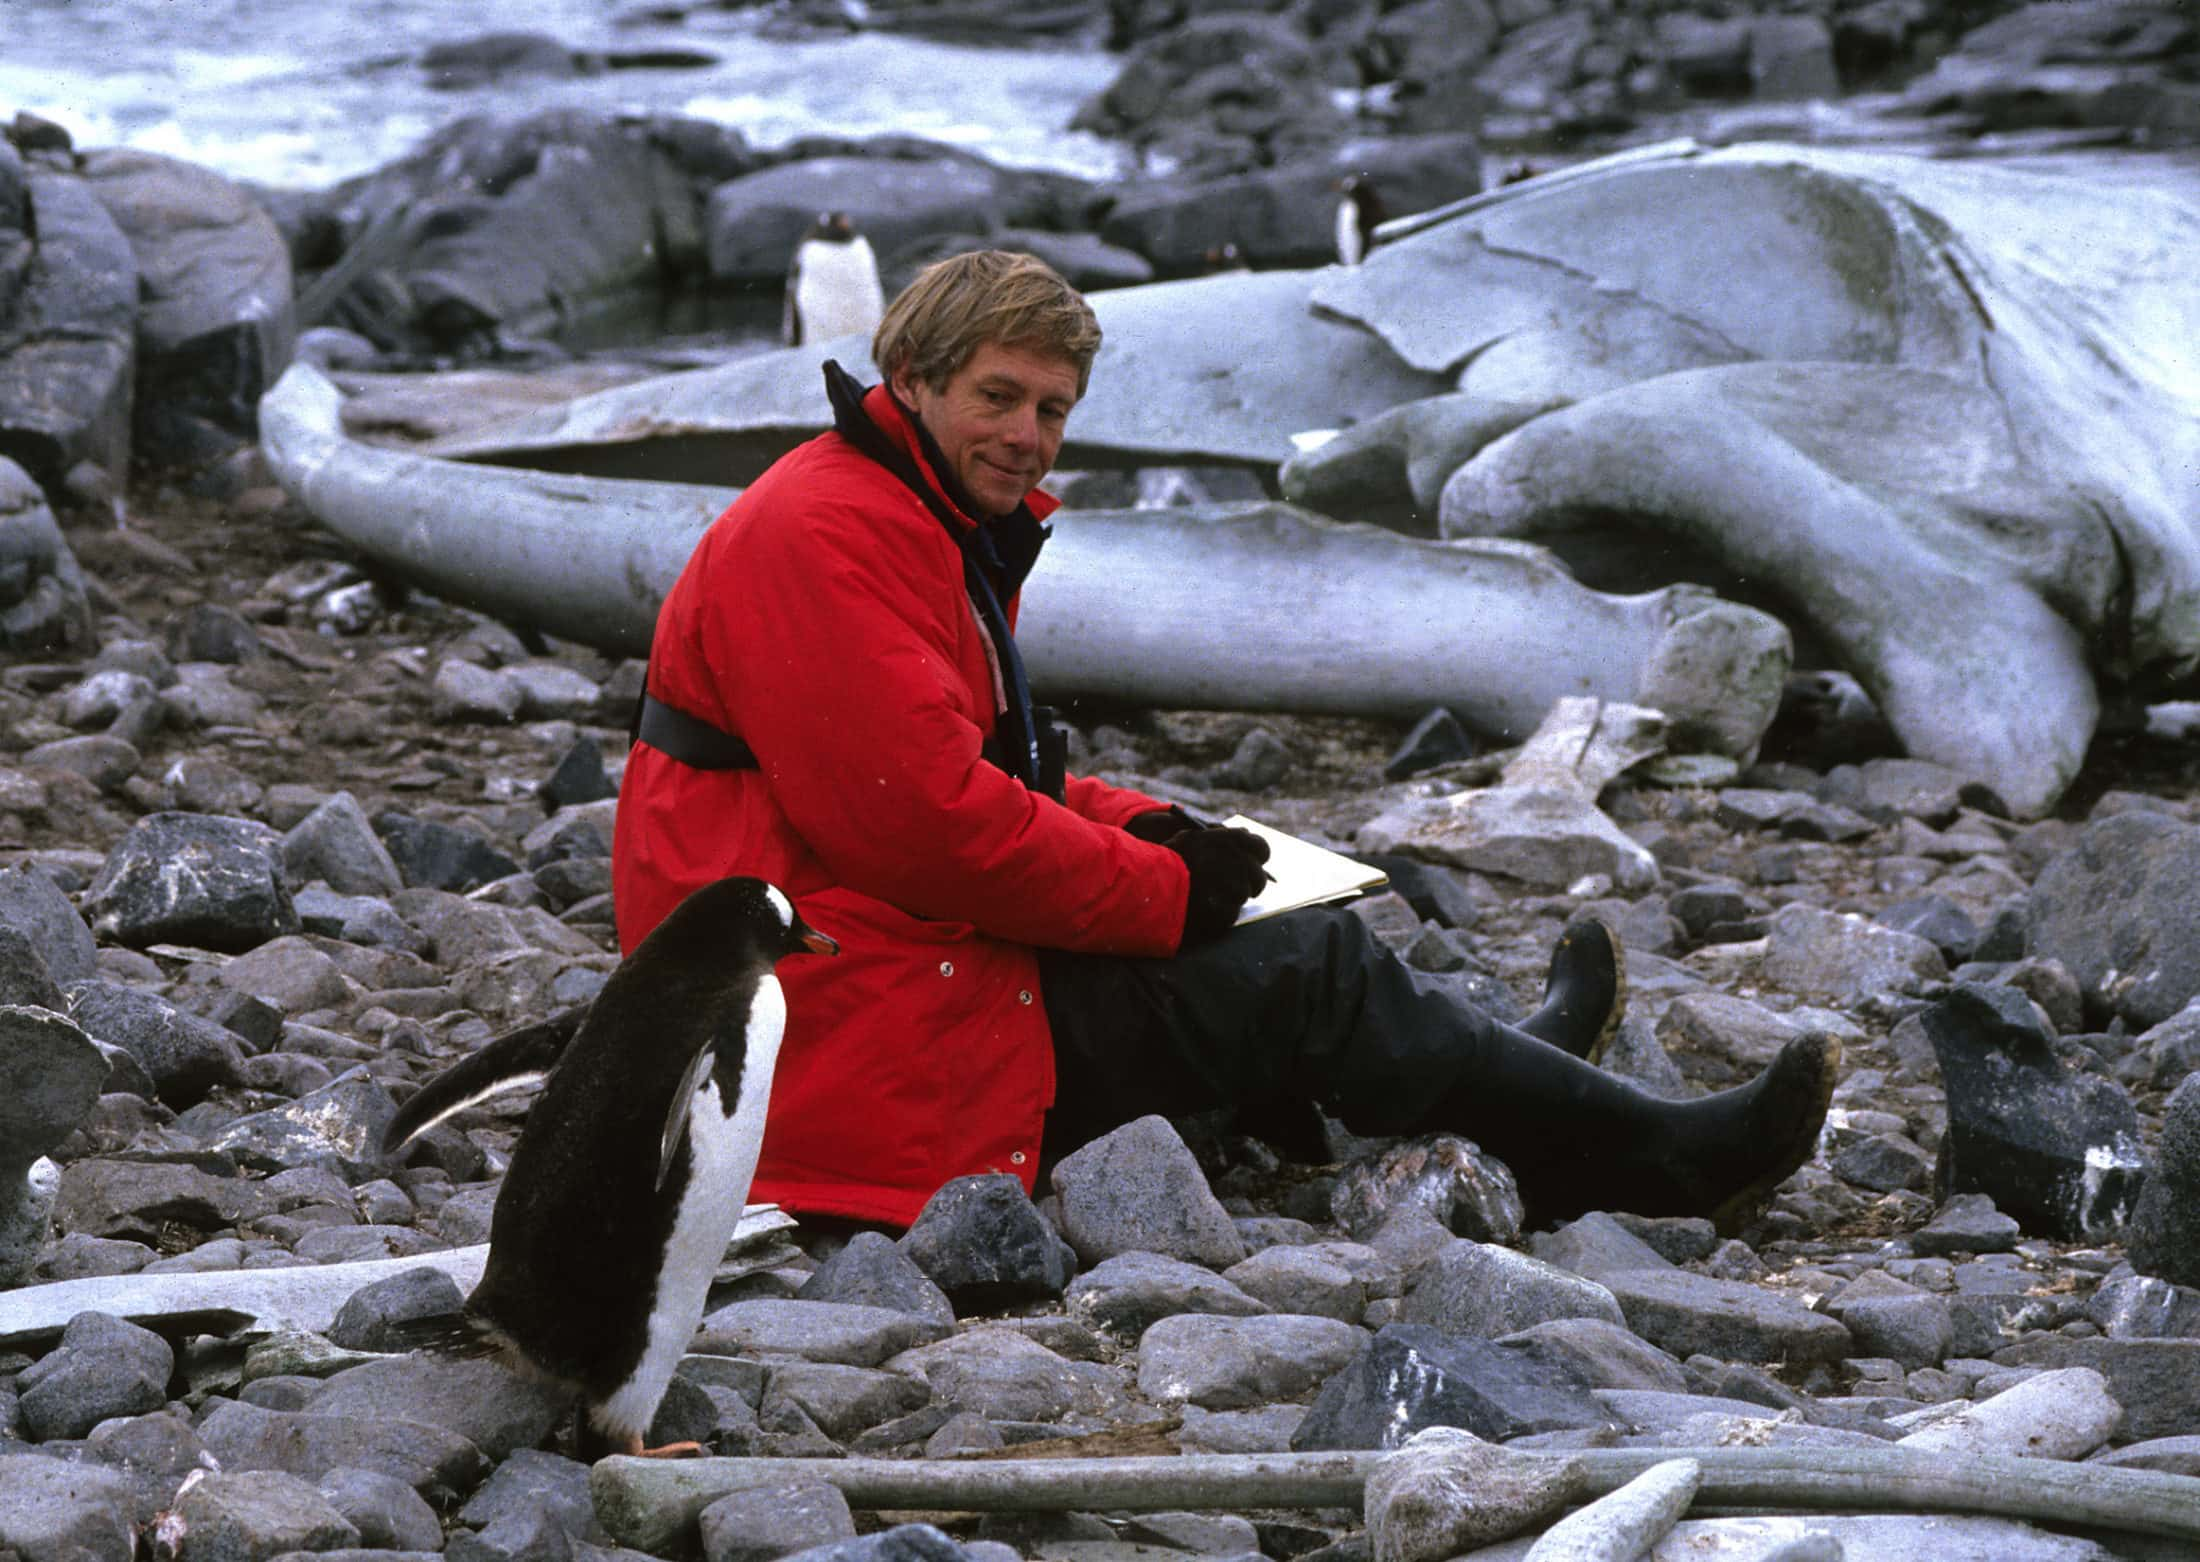 Robert Bateman and penguins, Antarctica